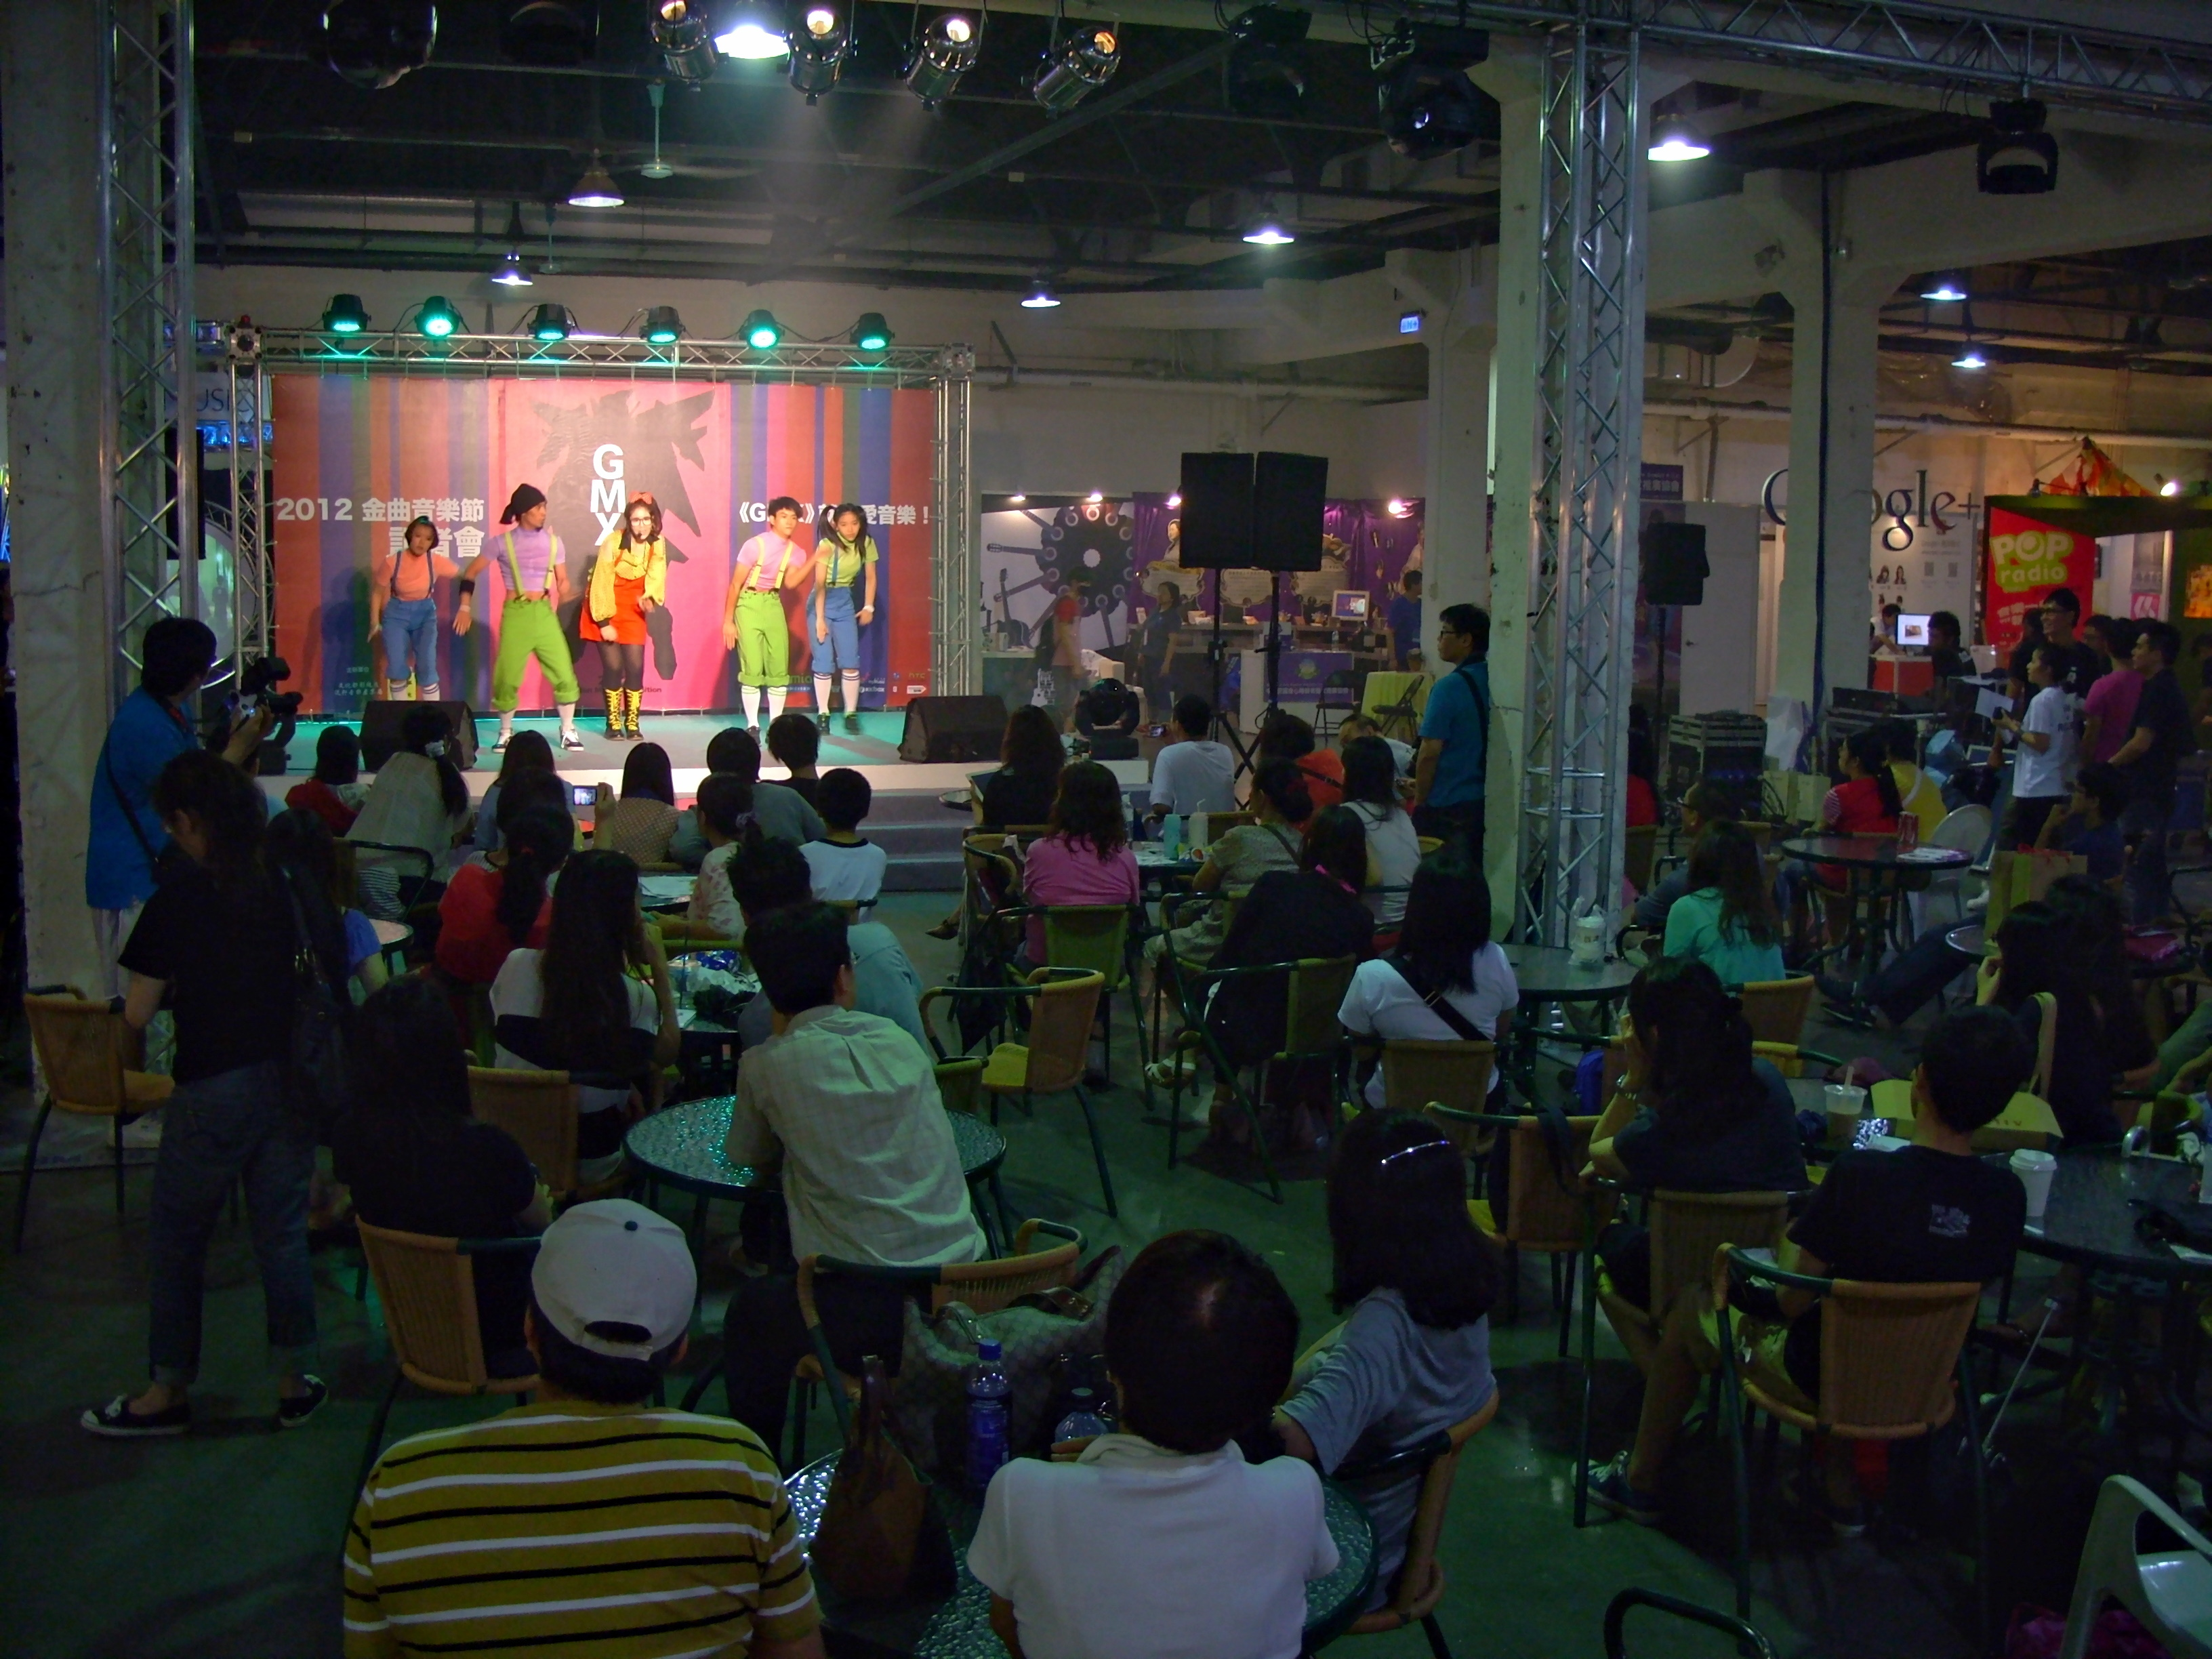 File:2012GMX Day2 Indoor Mini Stage Concert jpg - Wikimedia